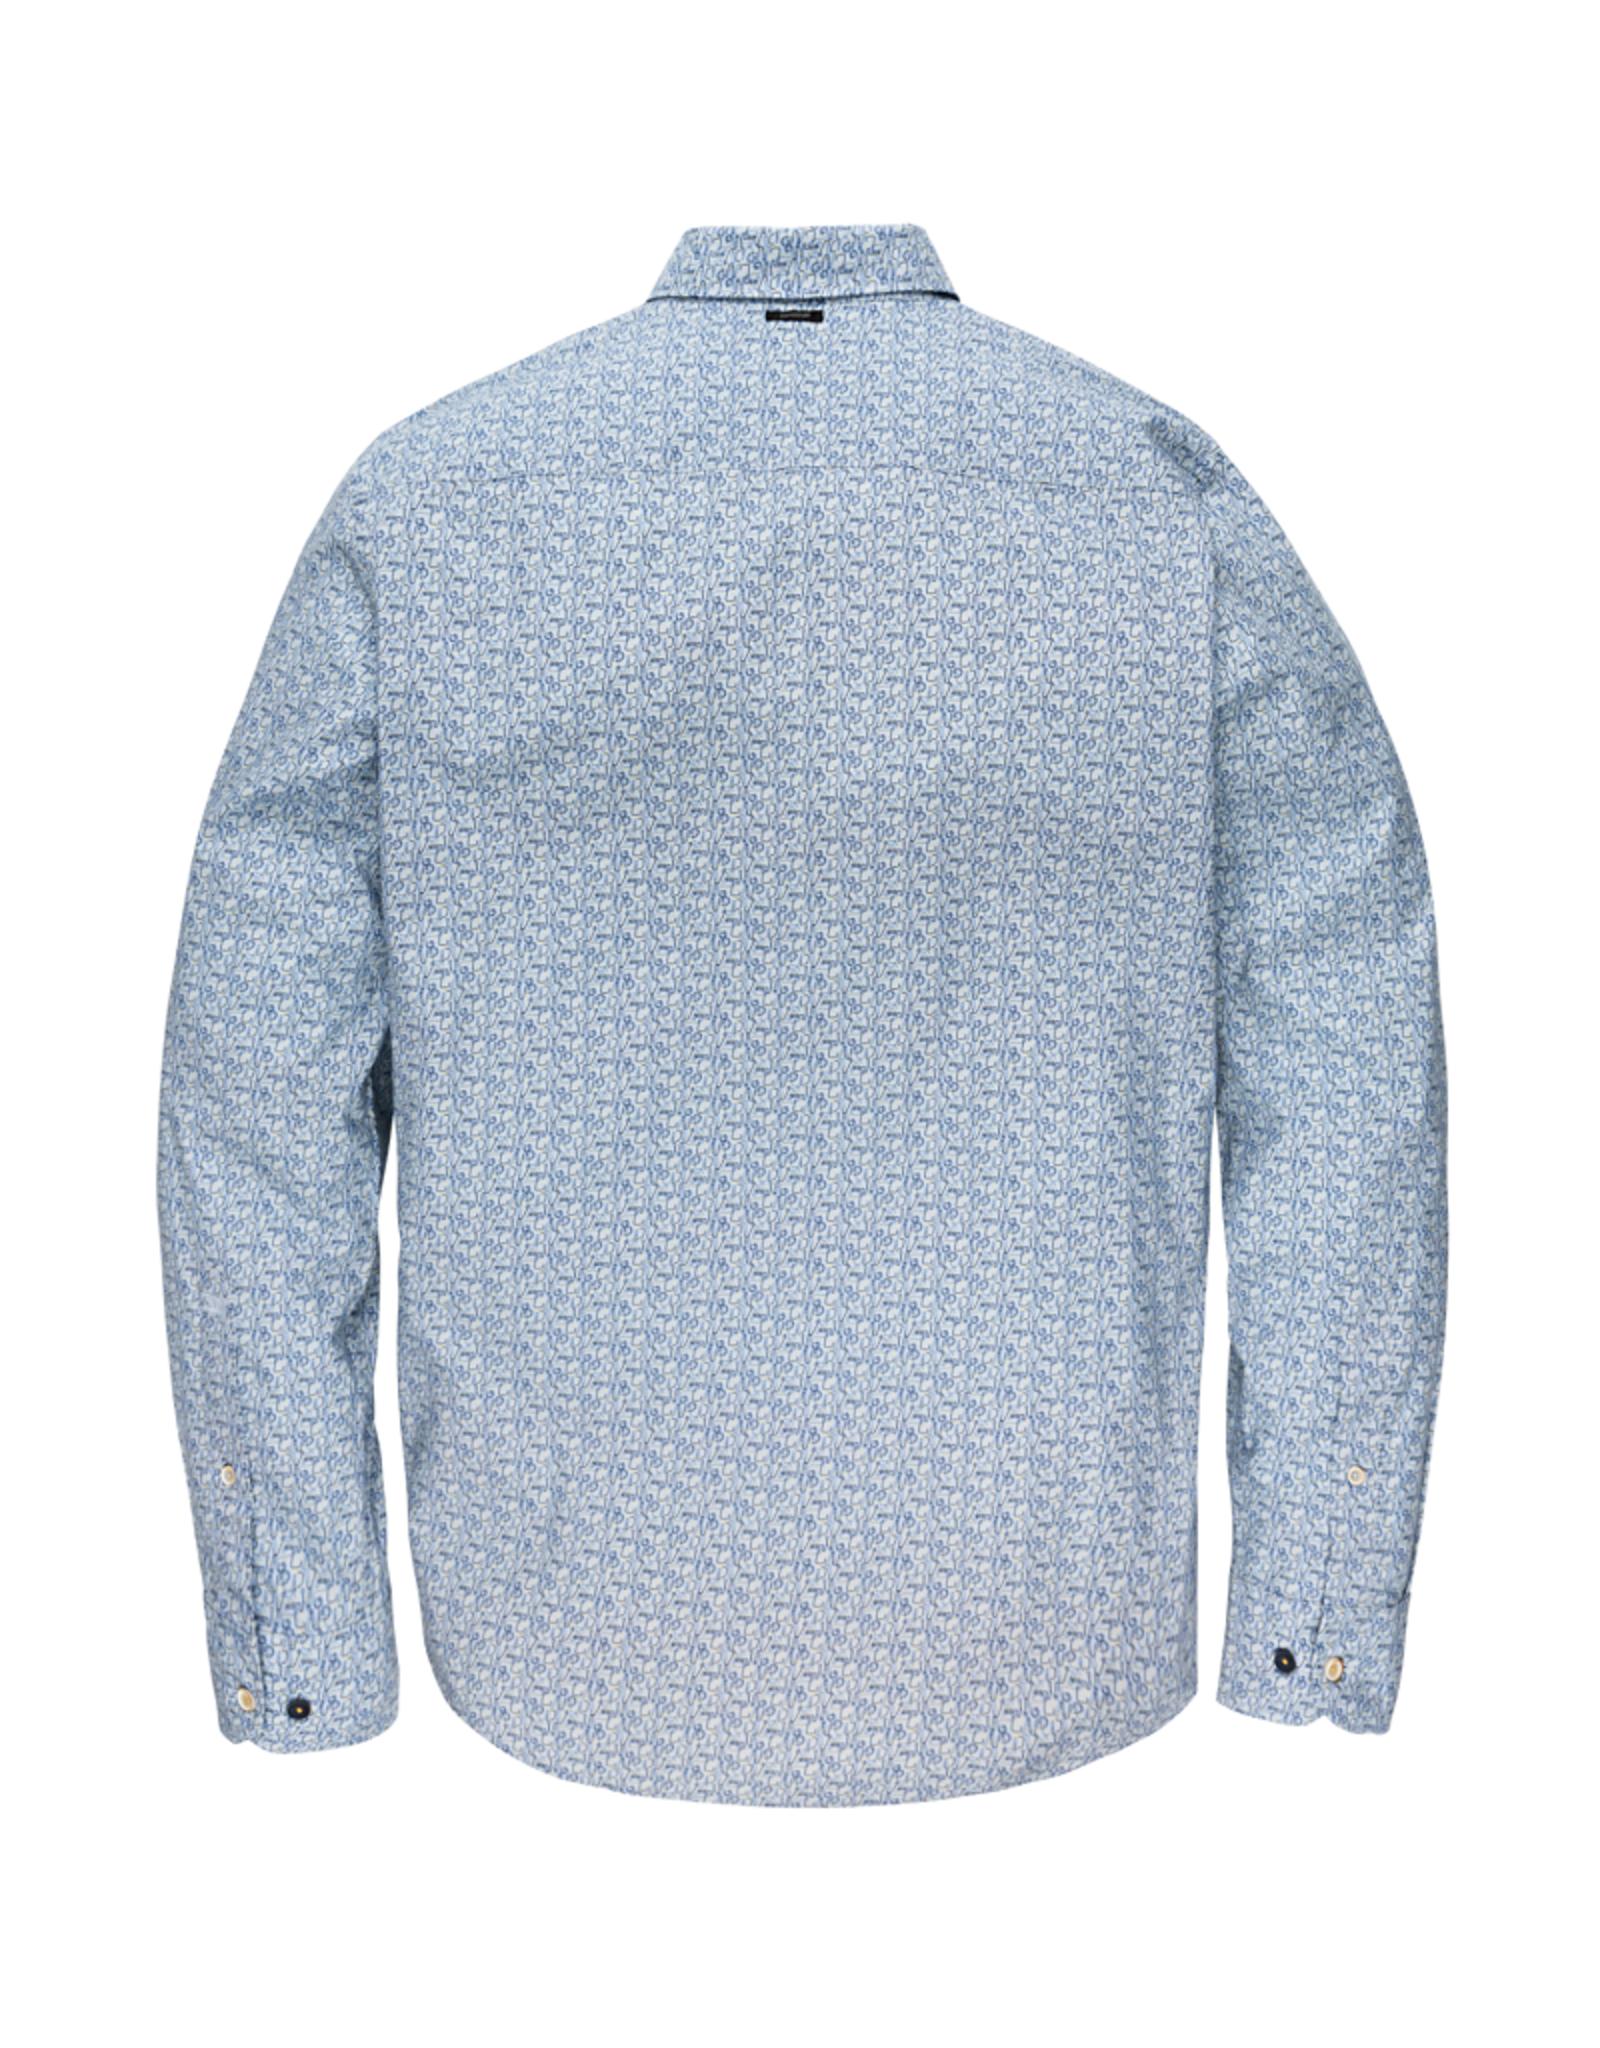 Vanguard Vanguard Longsleeve shirt printon poplin stretch 5300